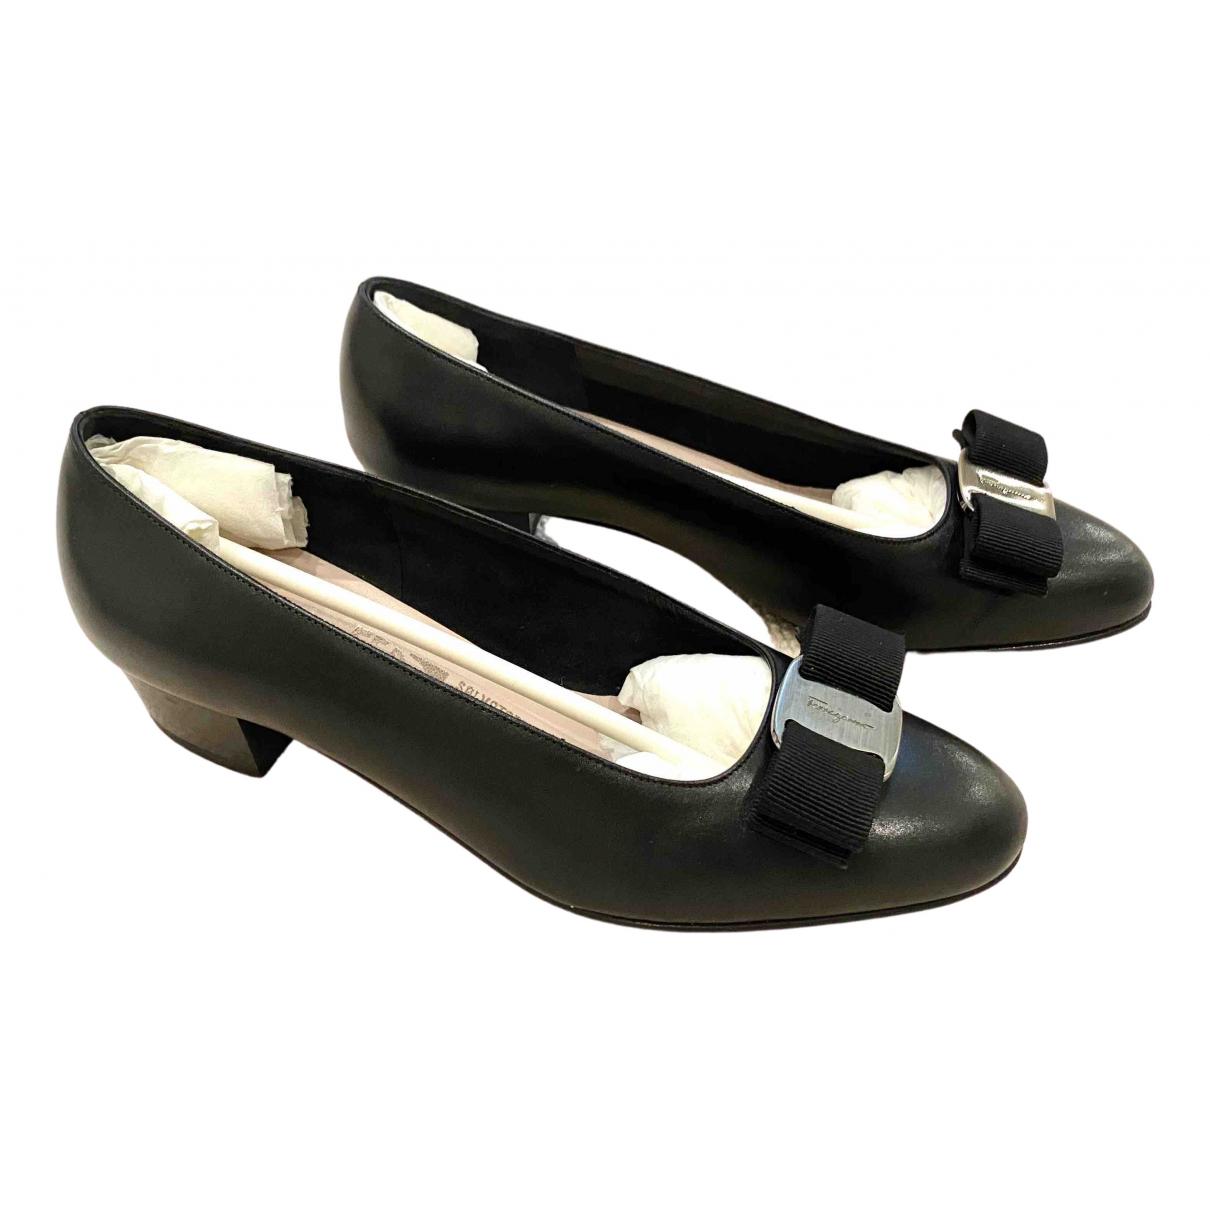 Salvatore Ferragamo \N Black Leather Heels for Women 5 US